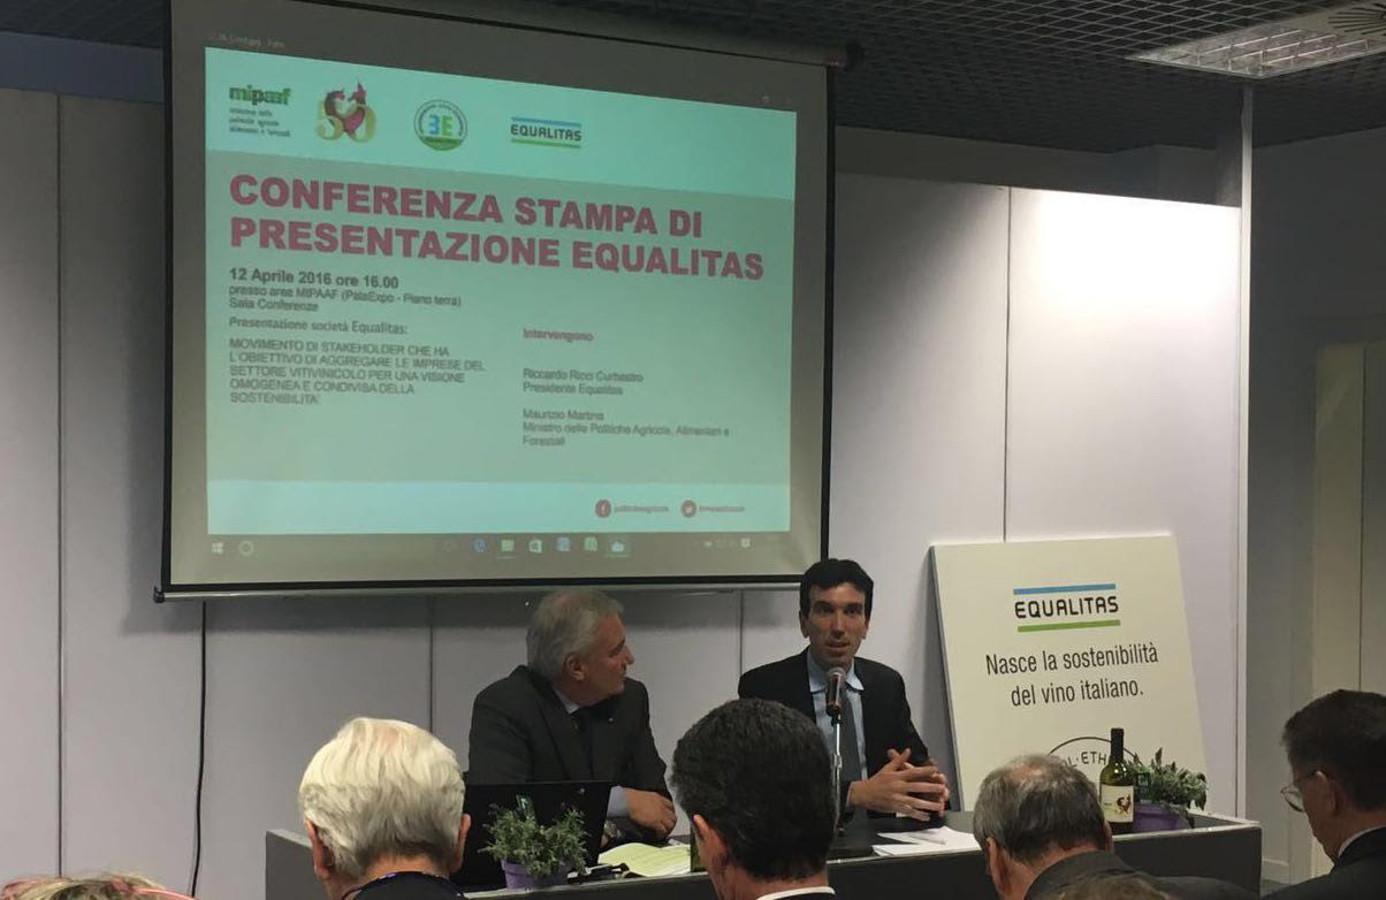 Ashtag Tweet Book e  Equalitas tra le novità di Vinitaly 2016